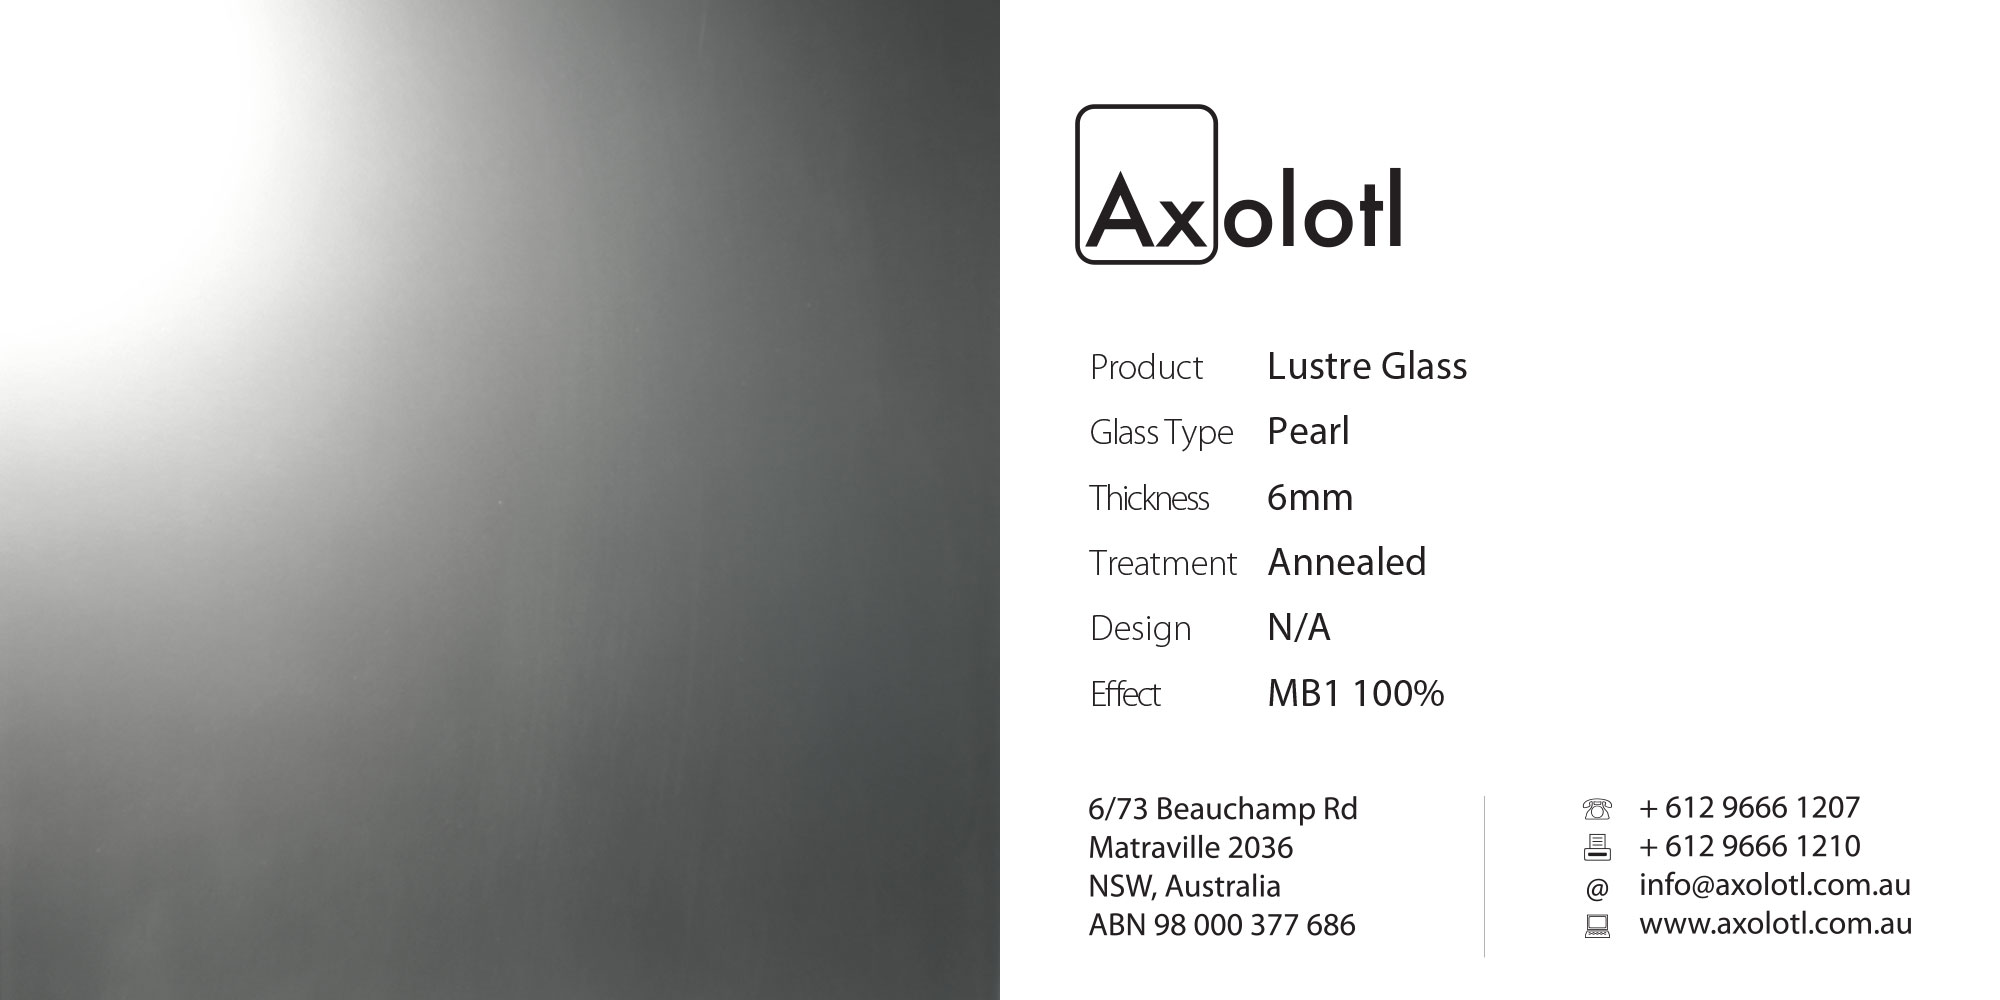 Axolotl_Glass_Lustre_Pearl.jpg